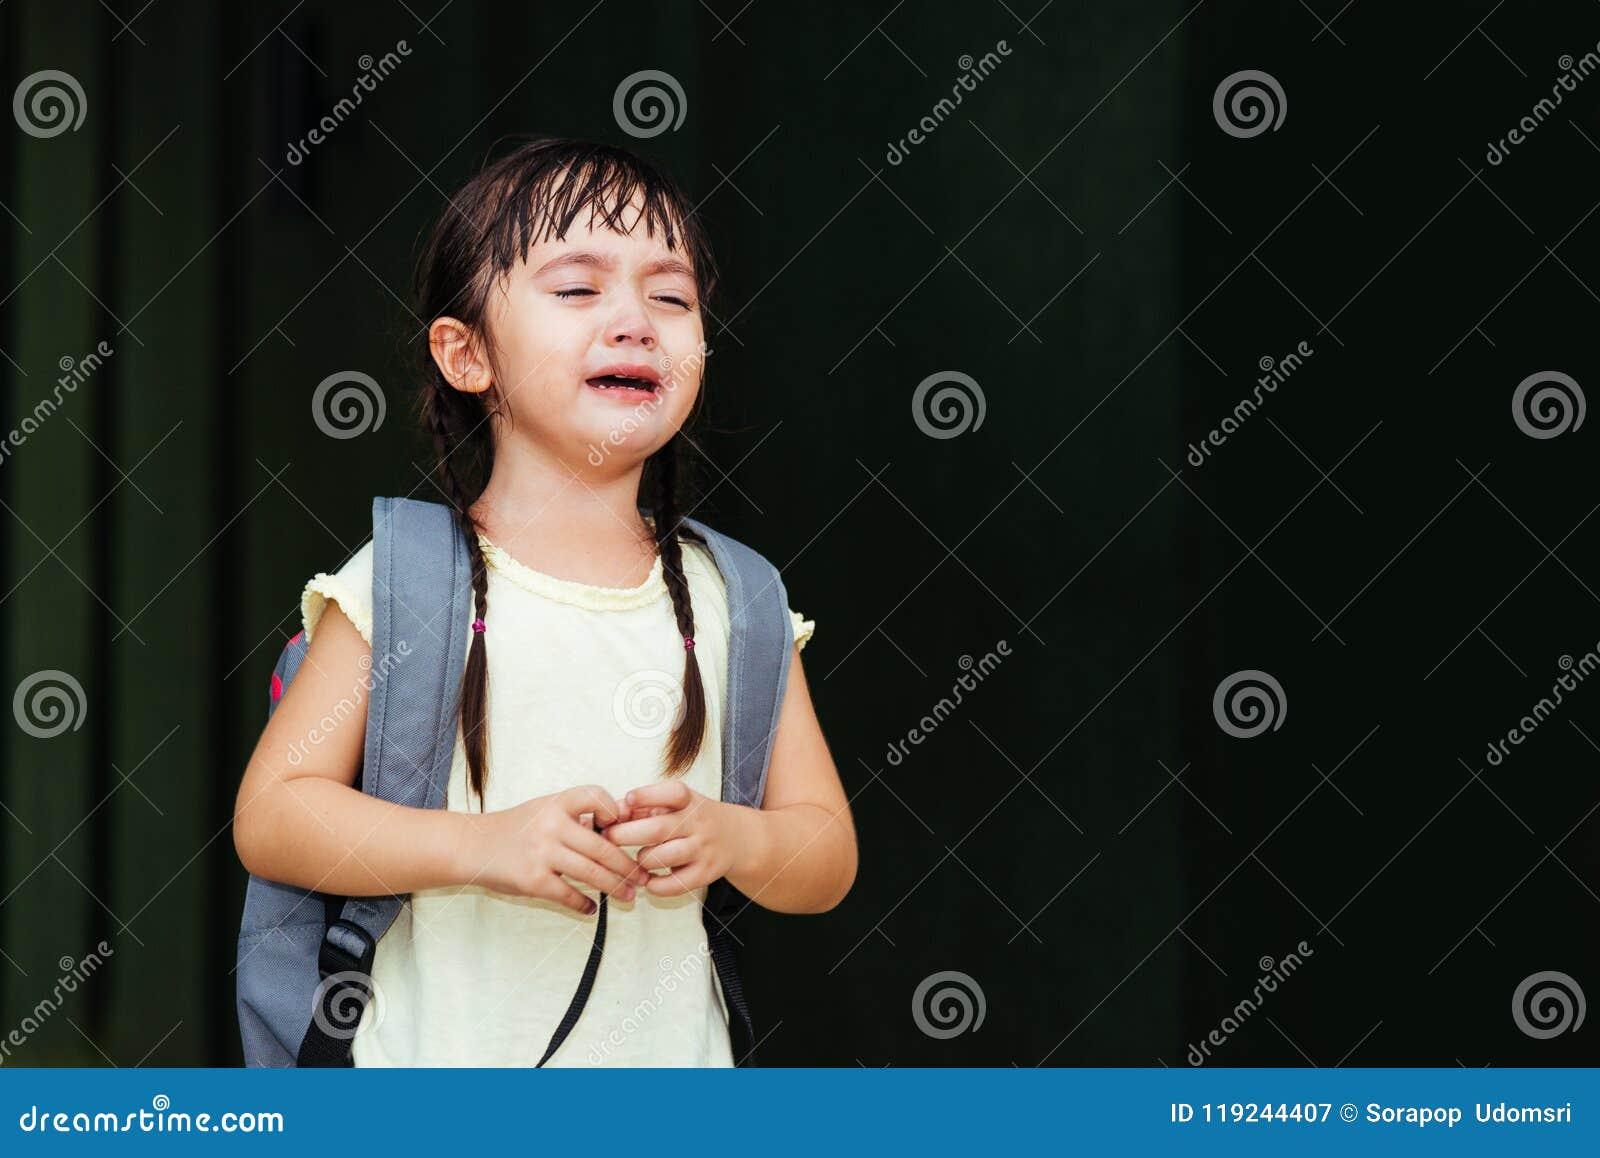 Children kid son girl kindergarten crying sad cry